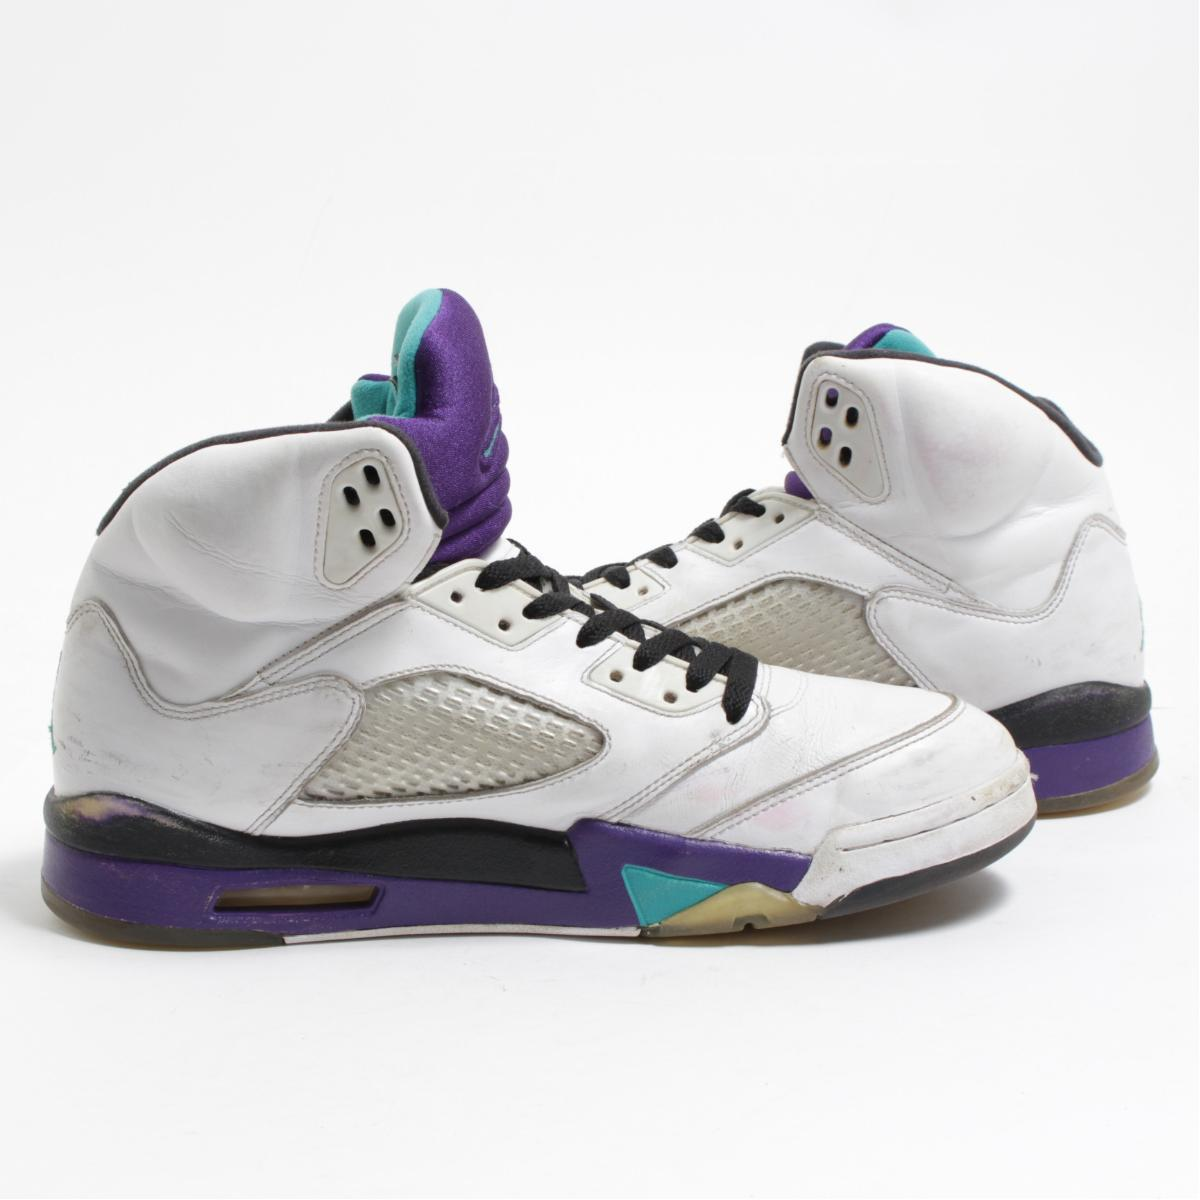 a9243d08c4cd VINTAGE CLOTHING JAM  Nike NIKE AIR JORDAN 5 RETRO GRAPE sneakers ...